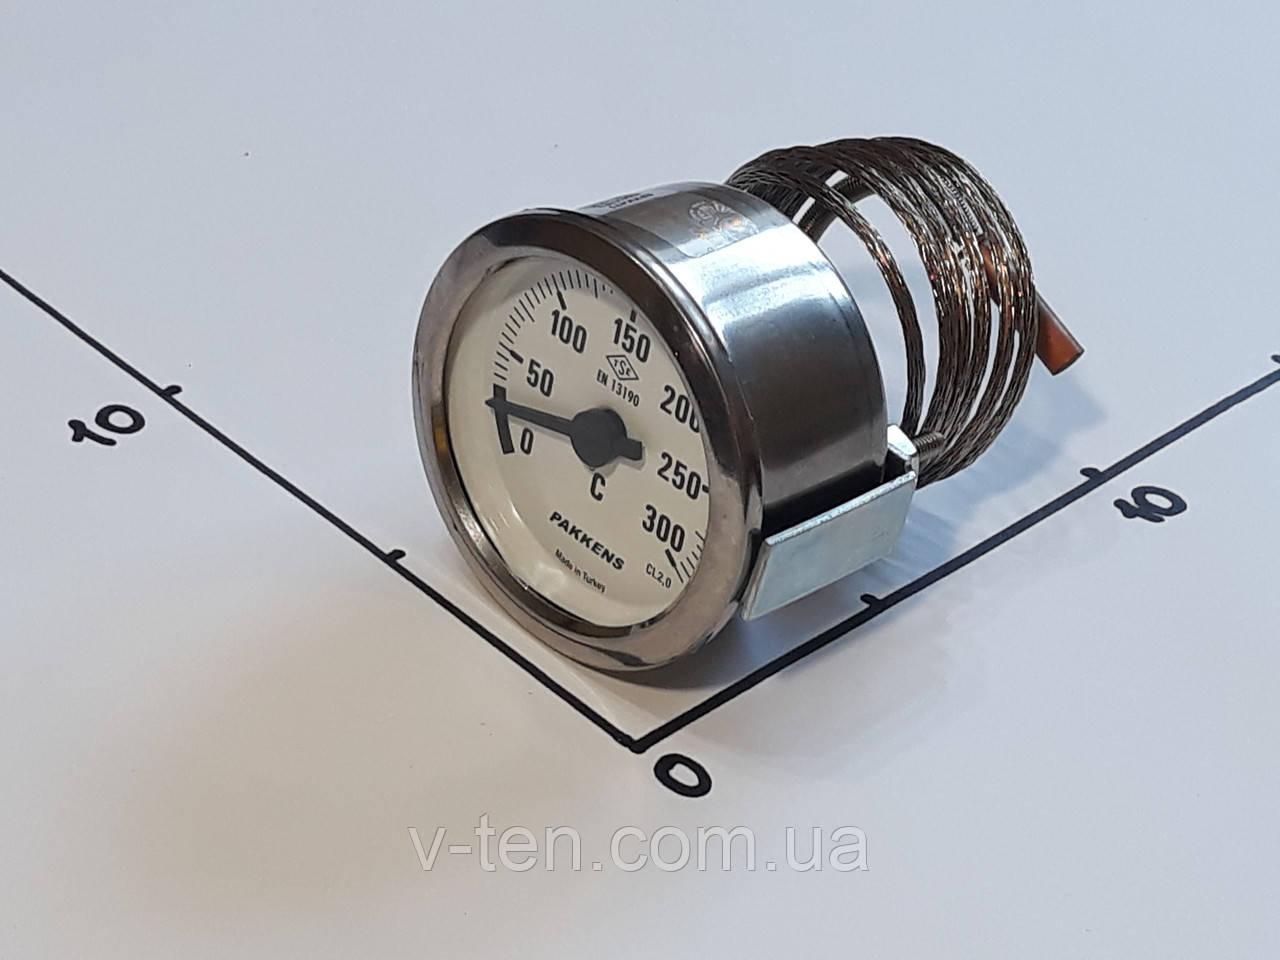 Термометр Ø60мм / 300°С / L-100 cм капиллярный PAKKENS (Турция)